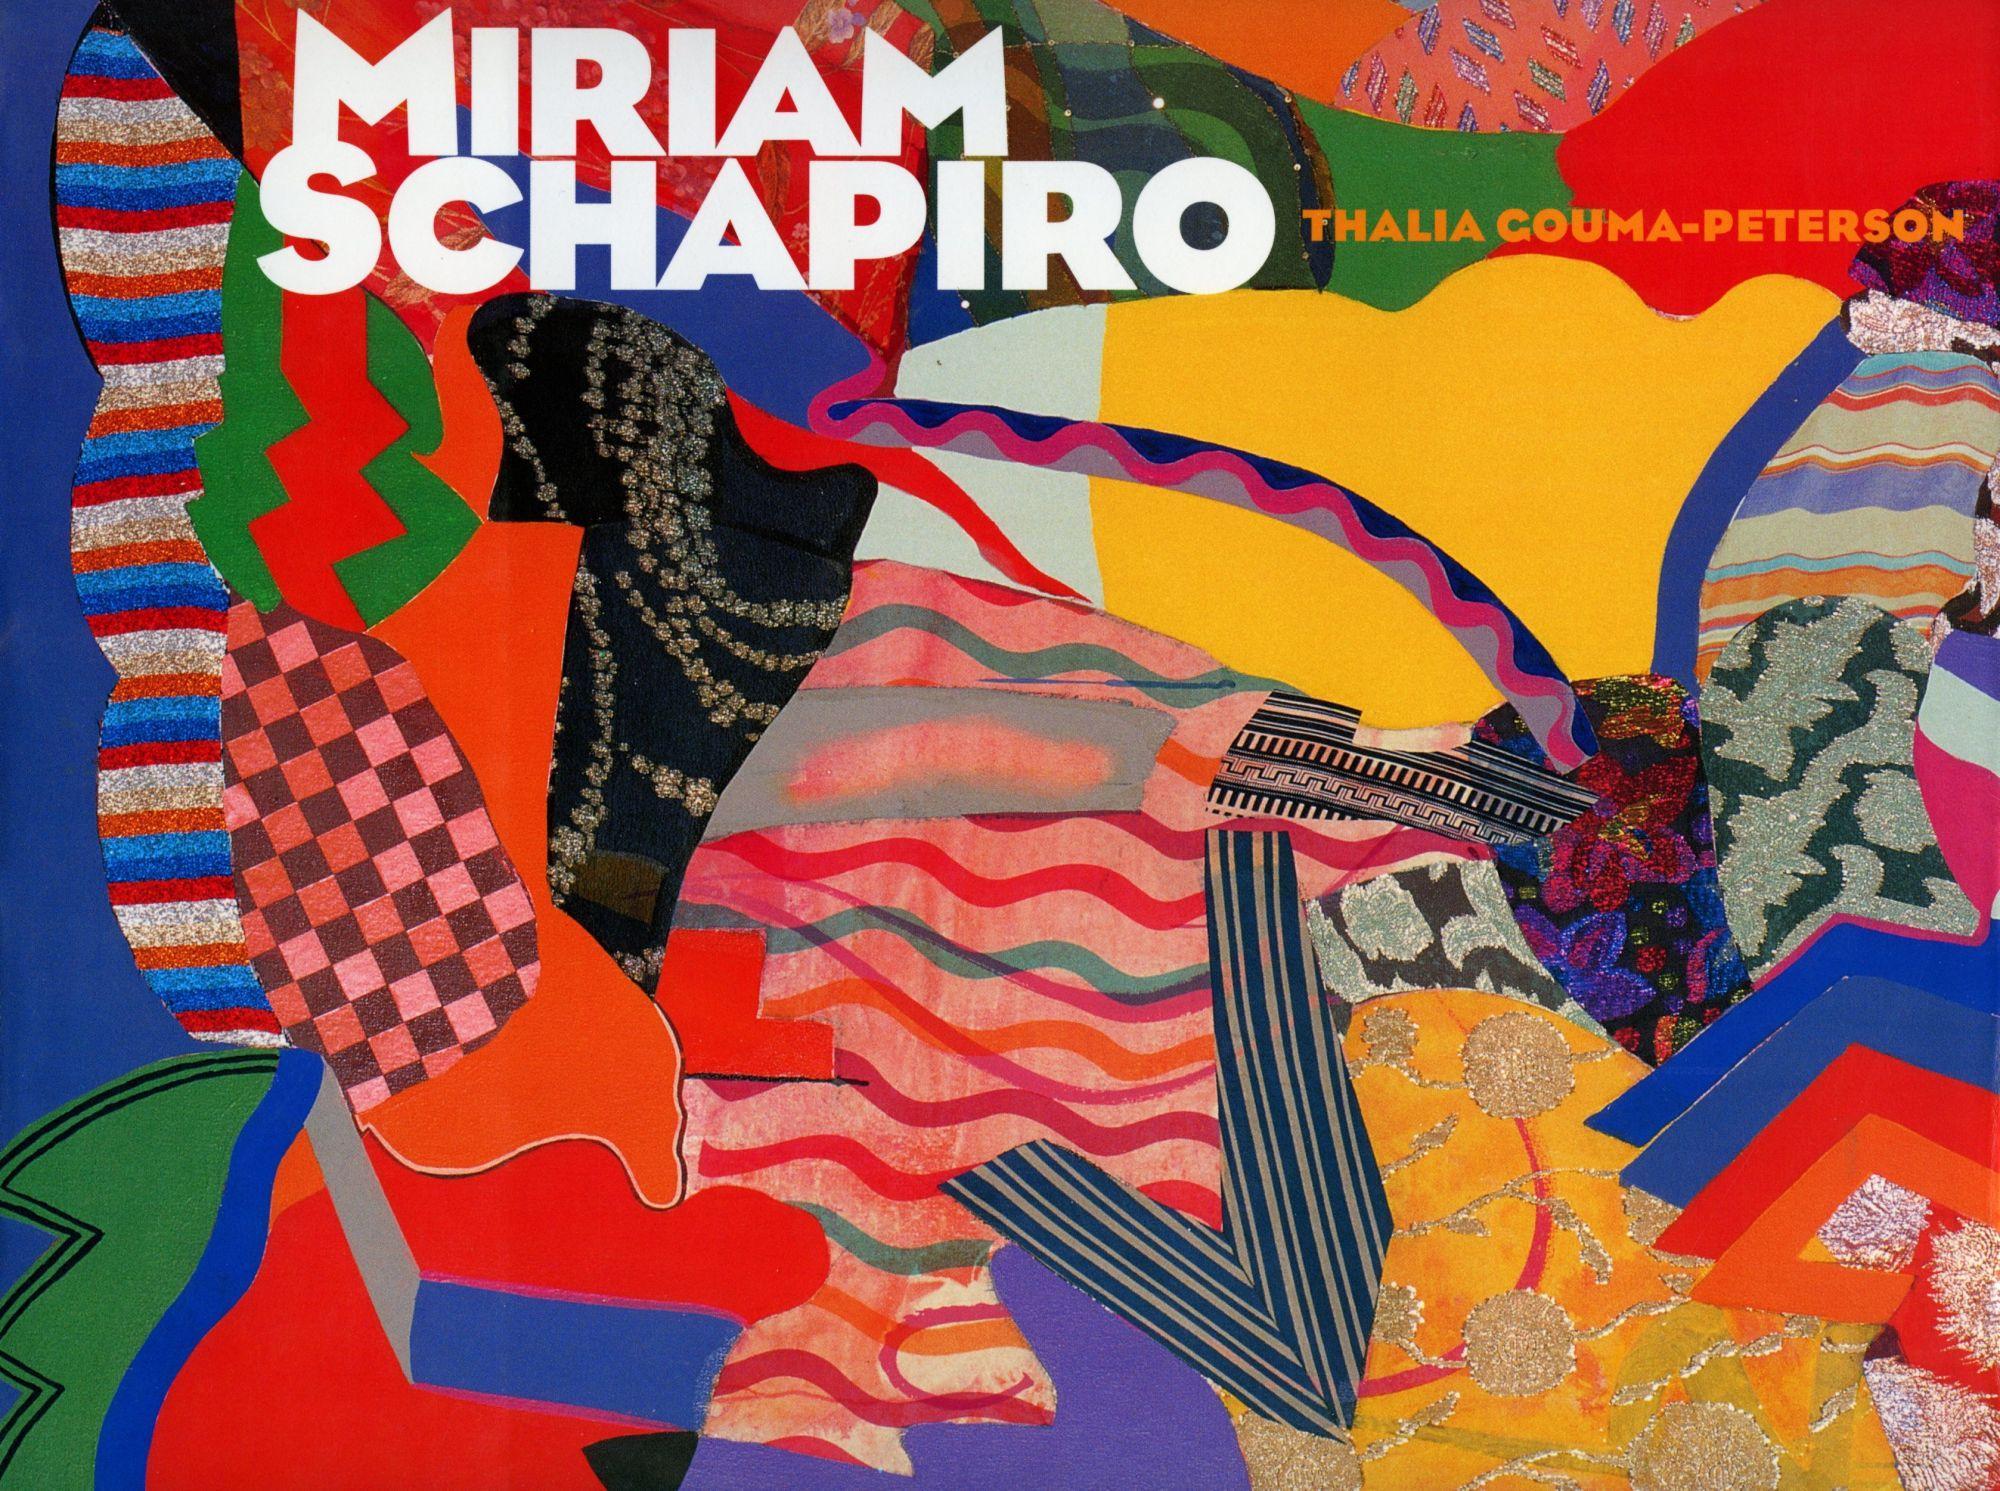 Miriam Schapiro Shaping The Fragments Of Art And Life GOUMA PETERSON THALIA